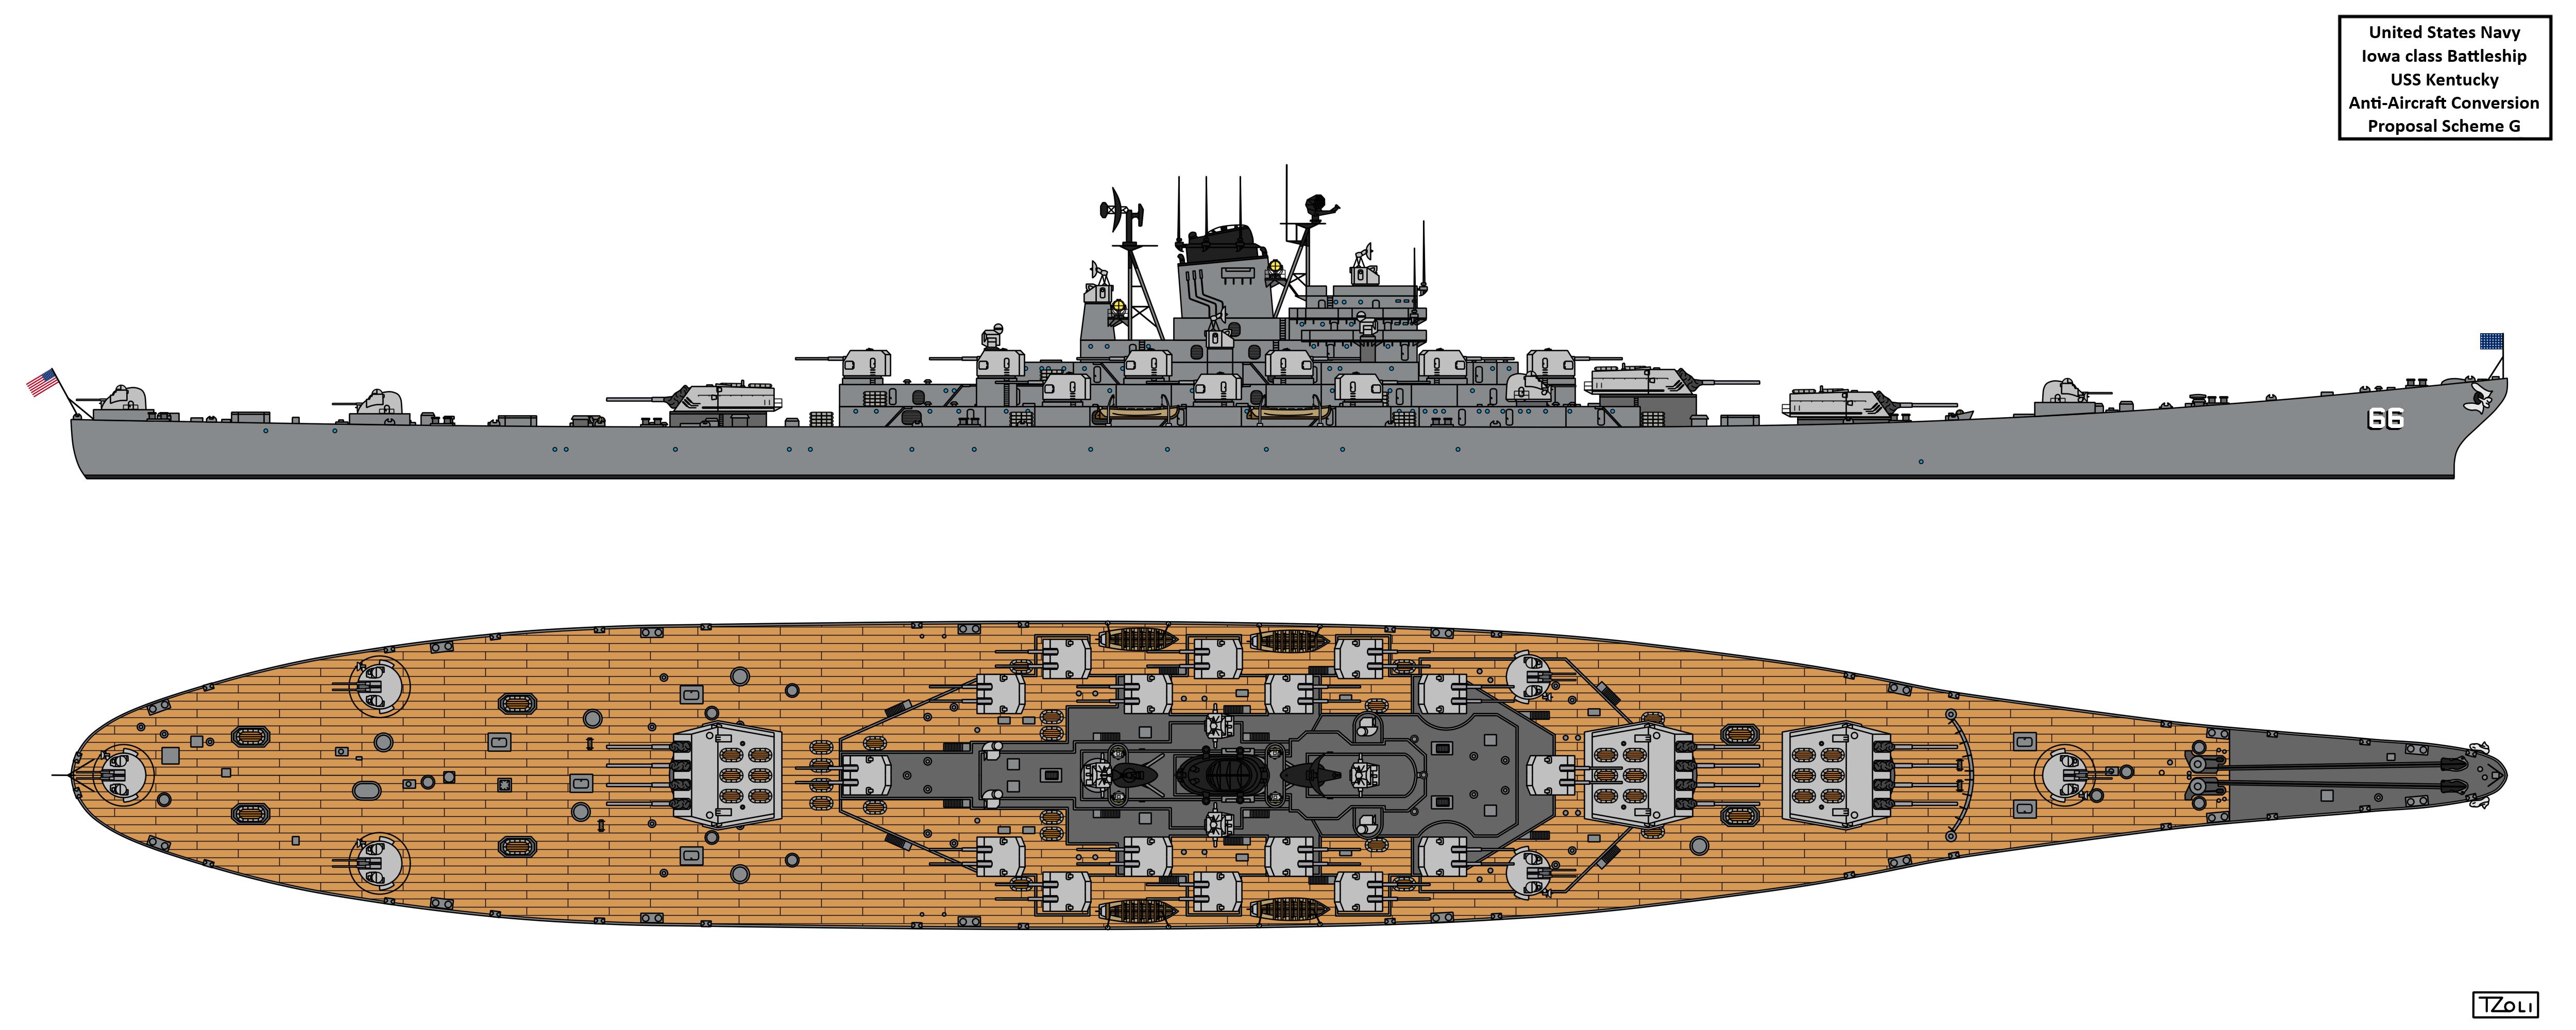 Anti-Aircraft Cruiser-Battleship USS Kentucky by Tzoli